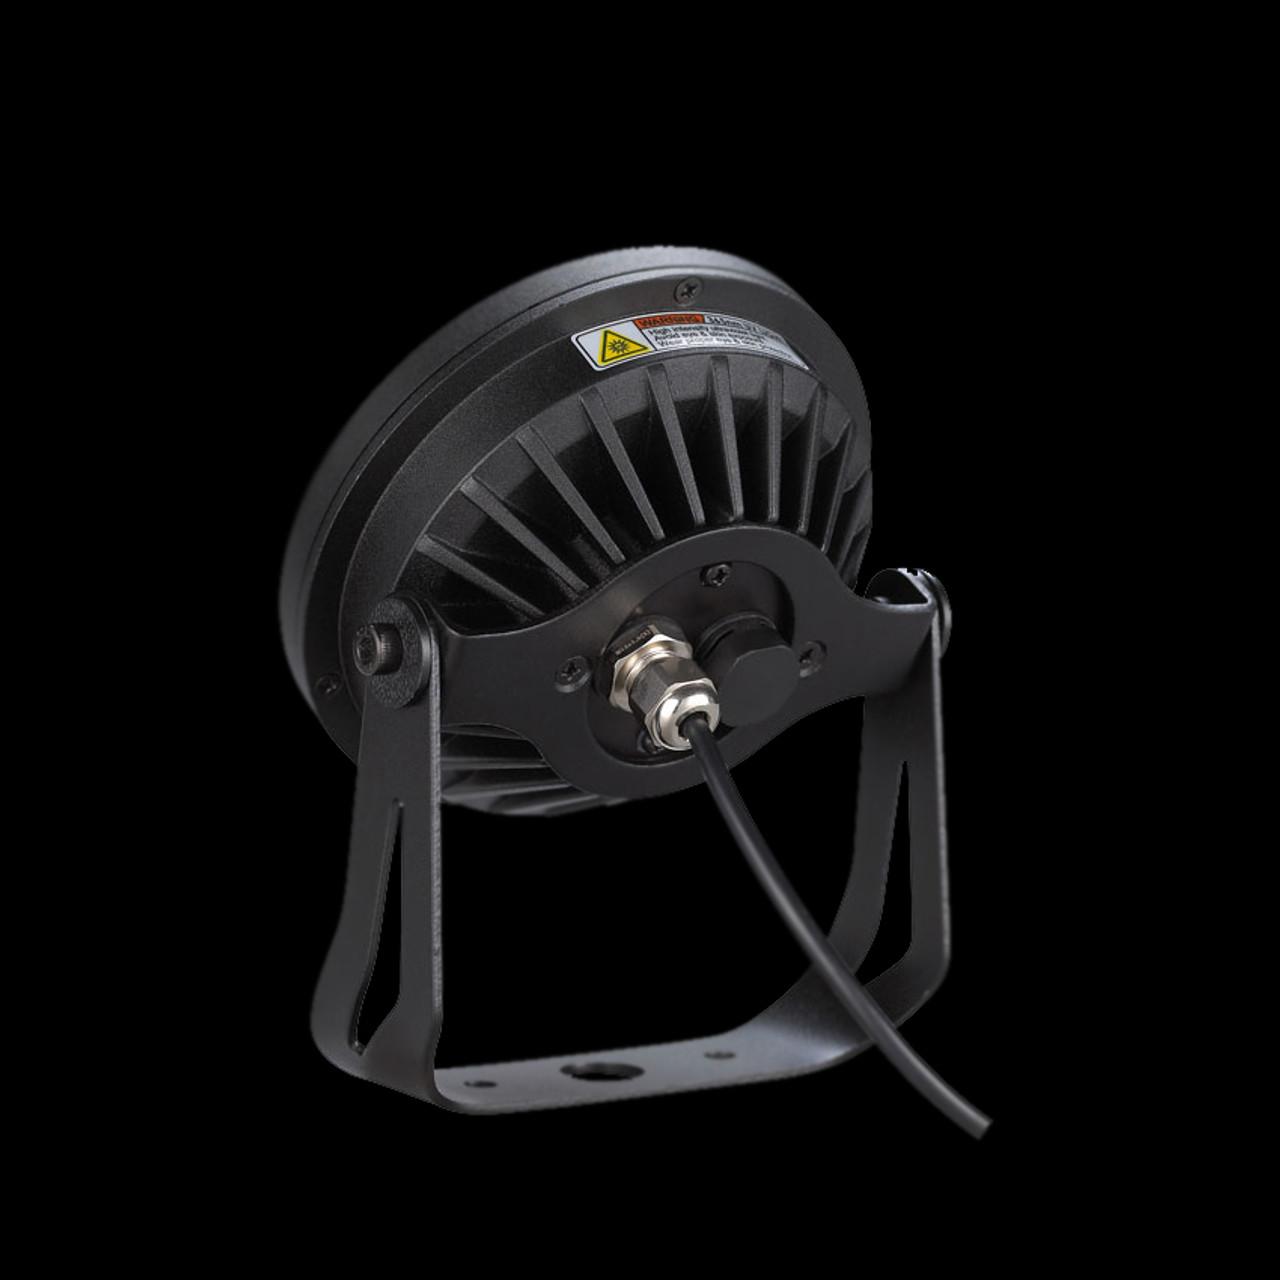 Antari DFXSpot 510IP Outdoor Rated LED UV Black Light Spot